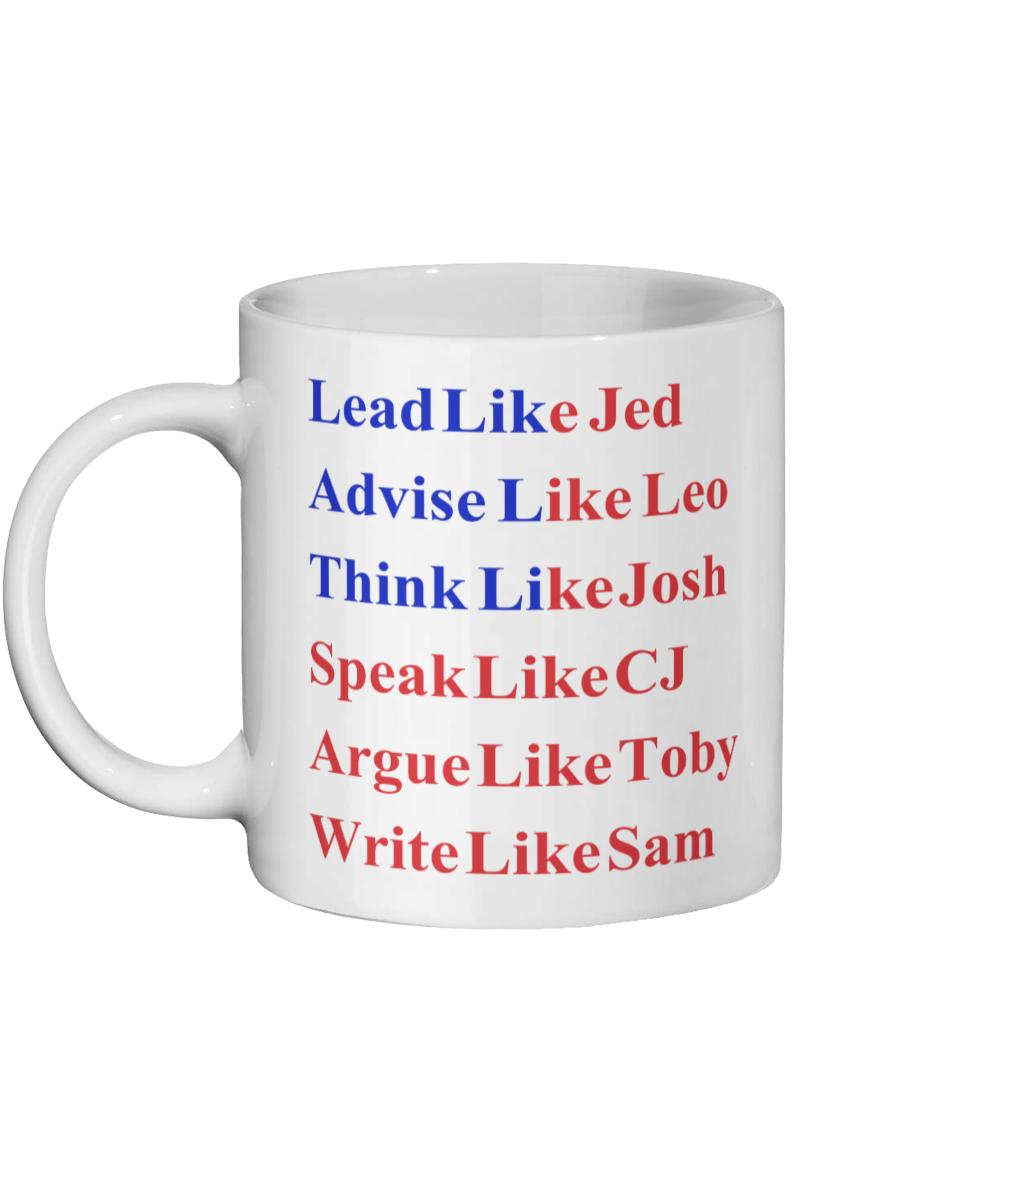 Lead Like Jed Flag West Wing Mug Left-side